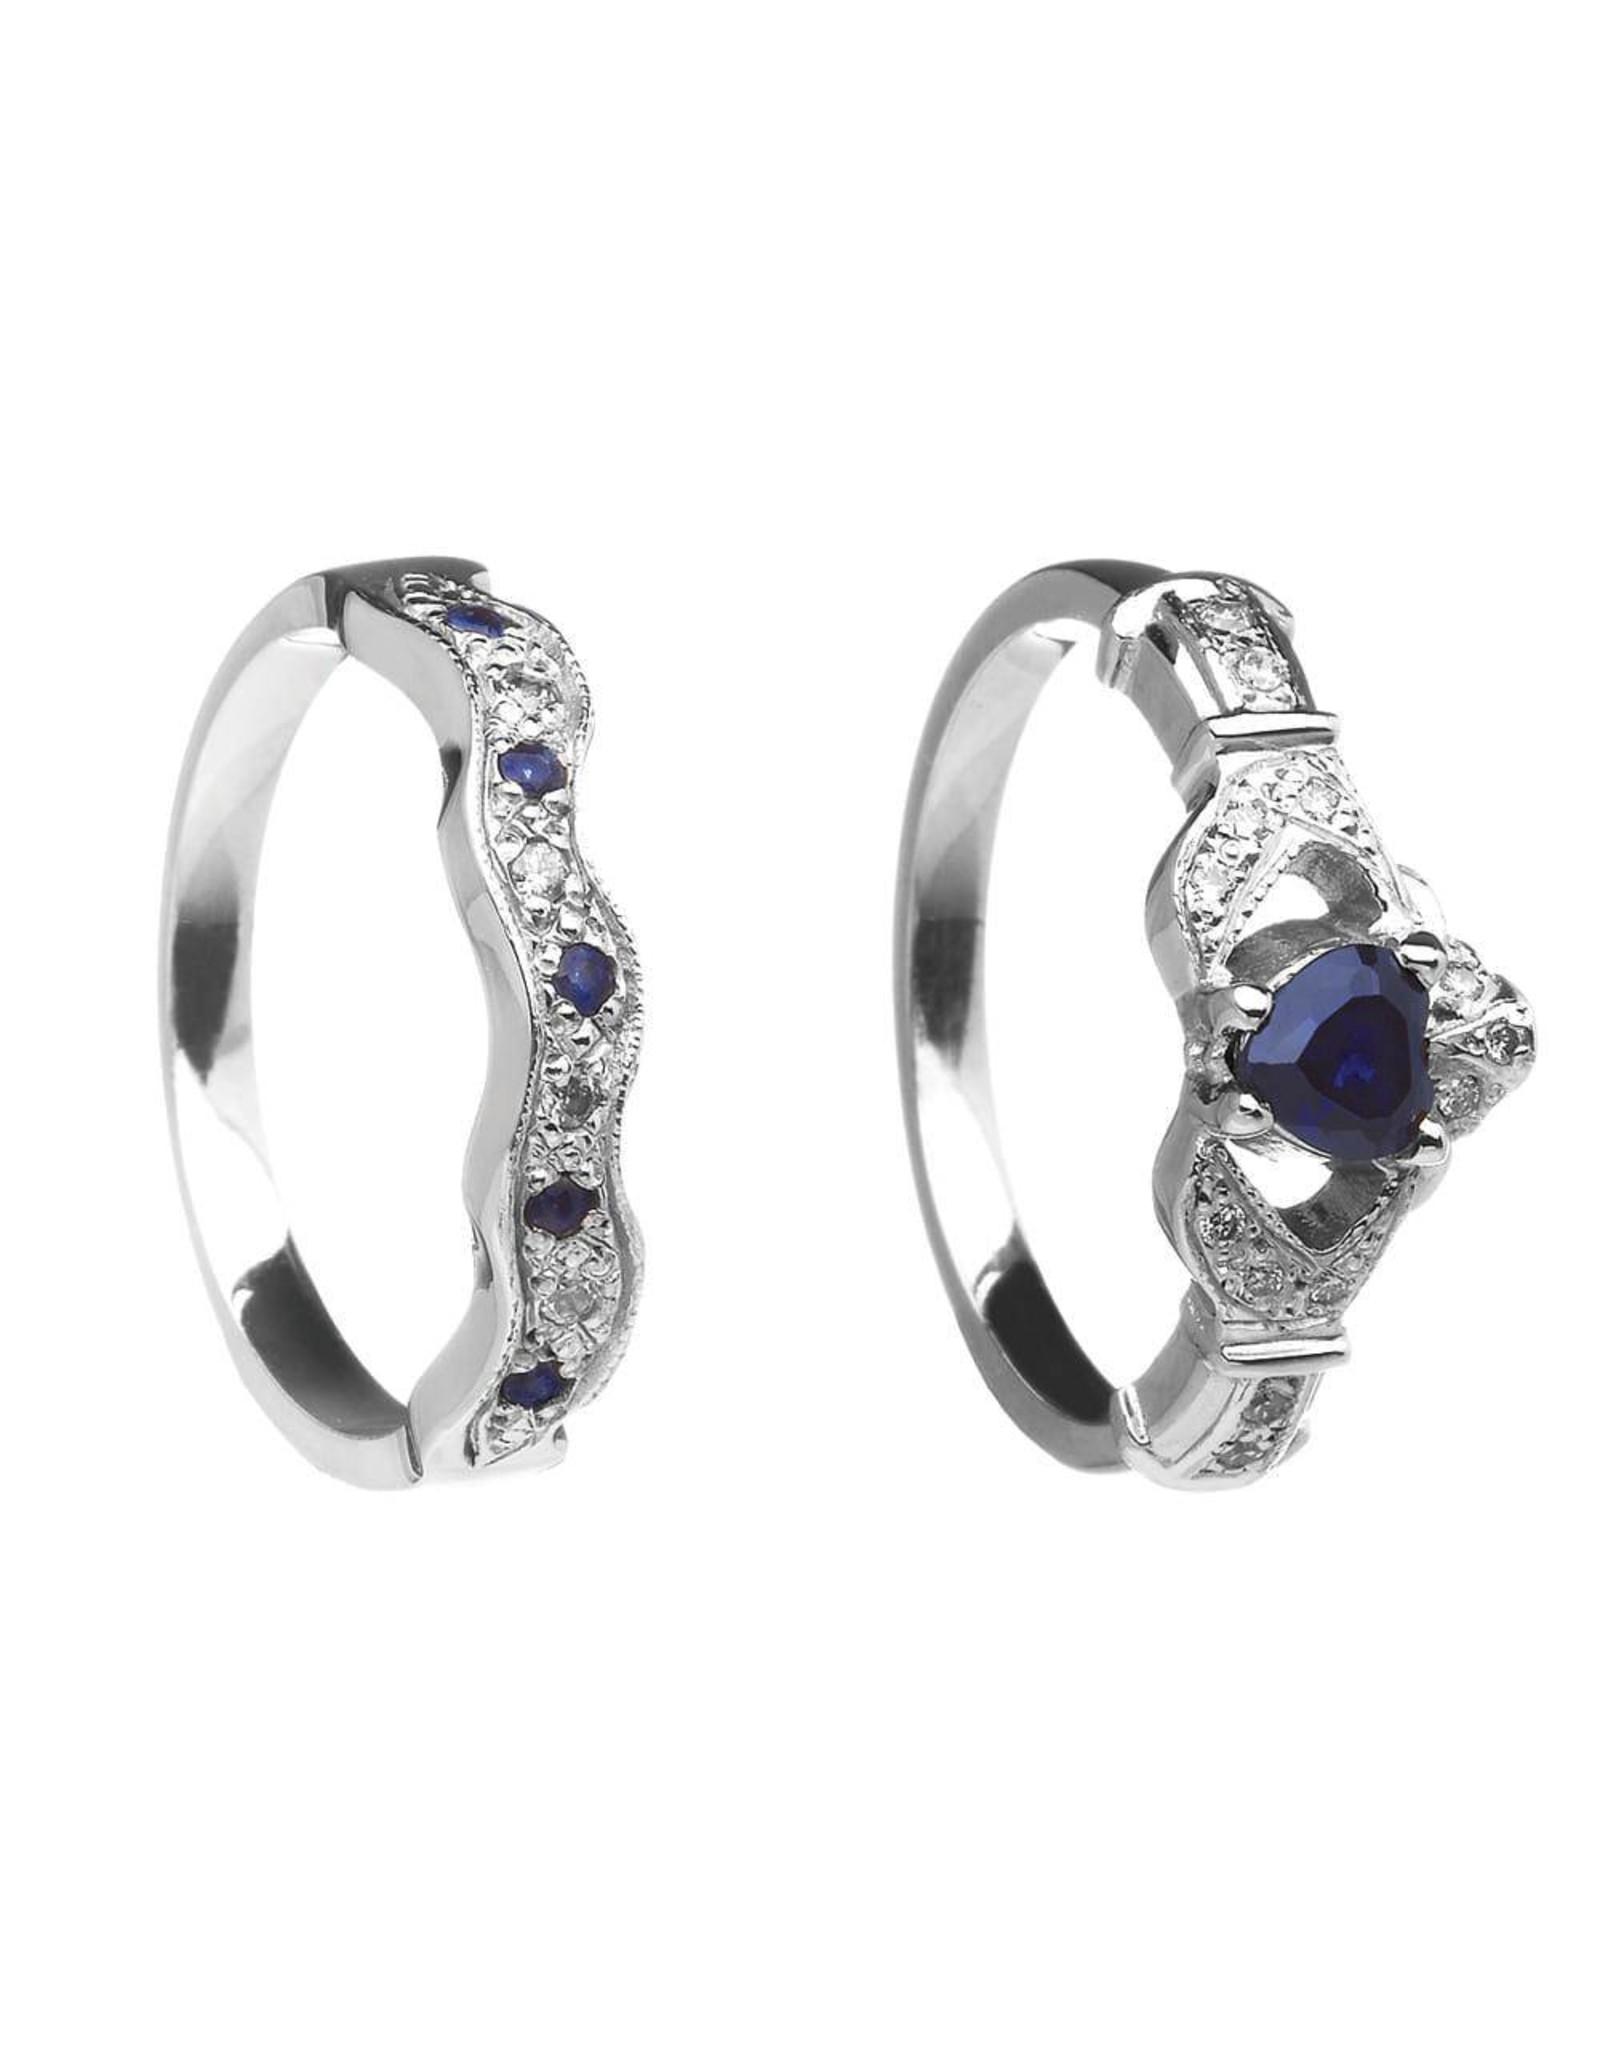 Boru Jewelry Diamond + Gemstone Claddagh Ring & Band